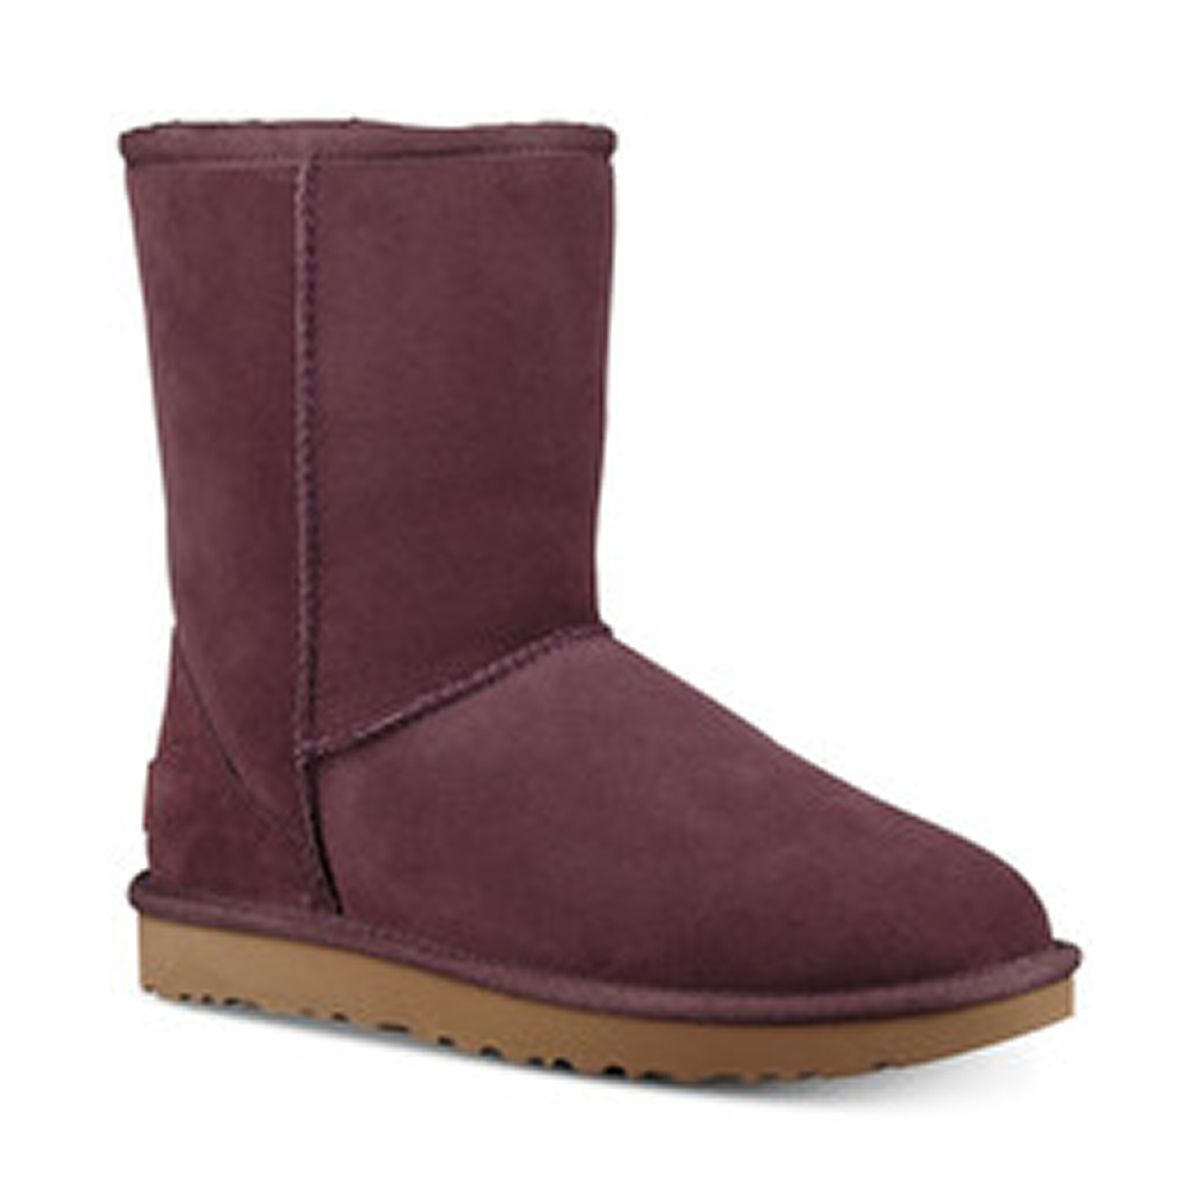 79c48798ace UGG® Women s Boots - Macy s